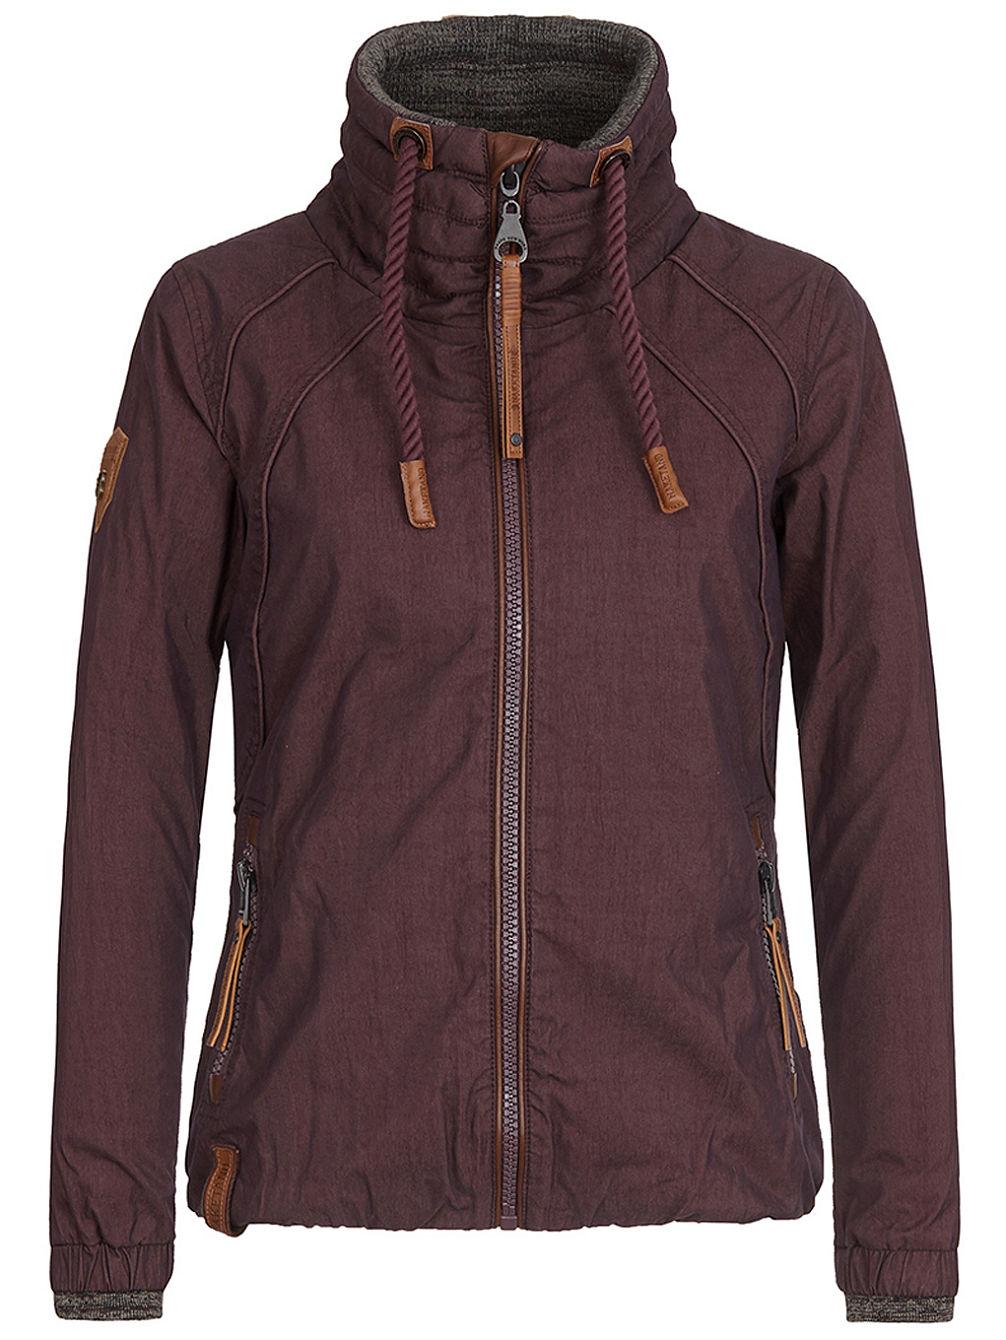 naketano tittis galore jacket online kaufen bei blue. Black Bedroom Furniture Sets. Home Design Ideas